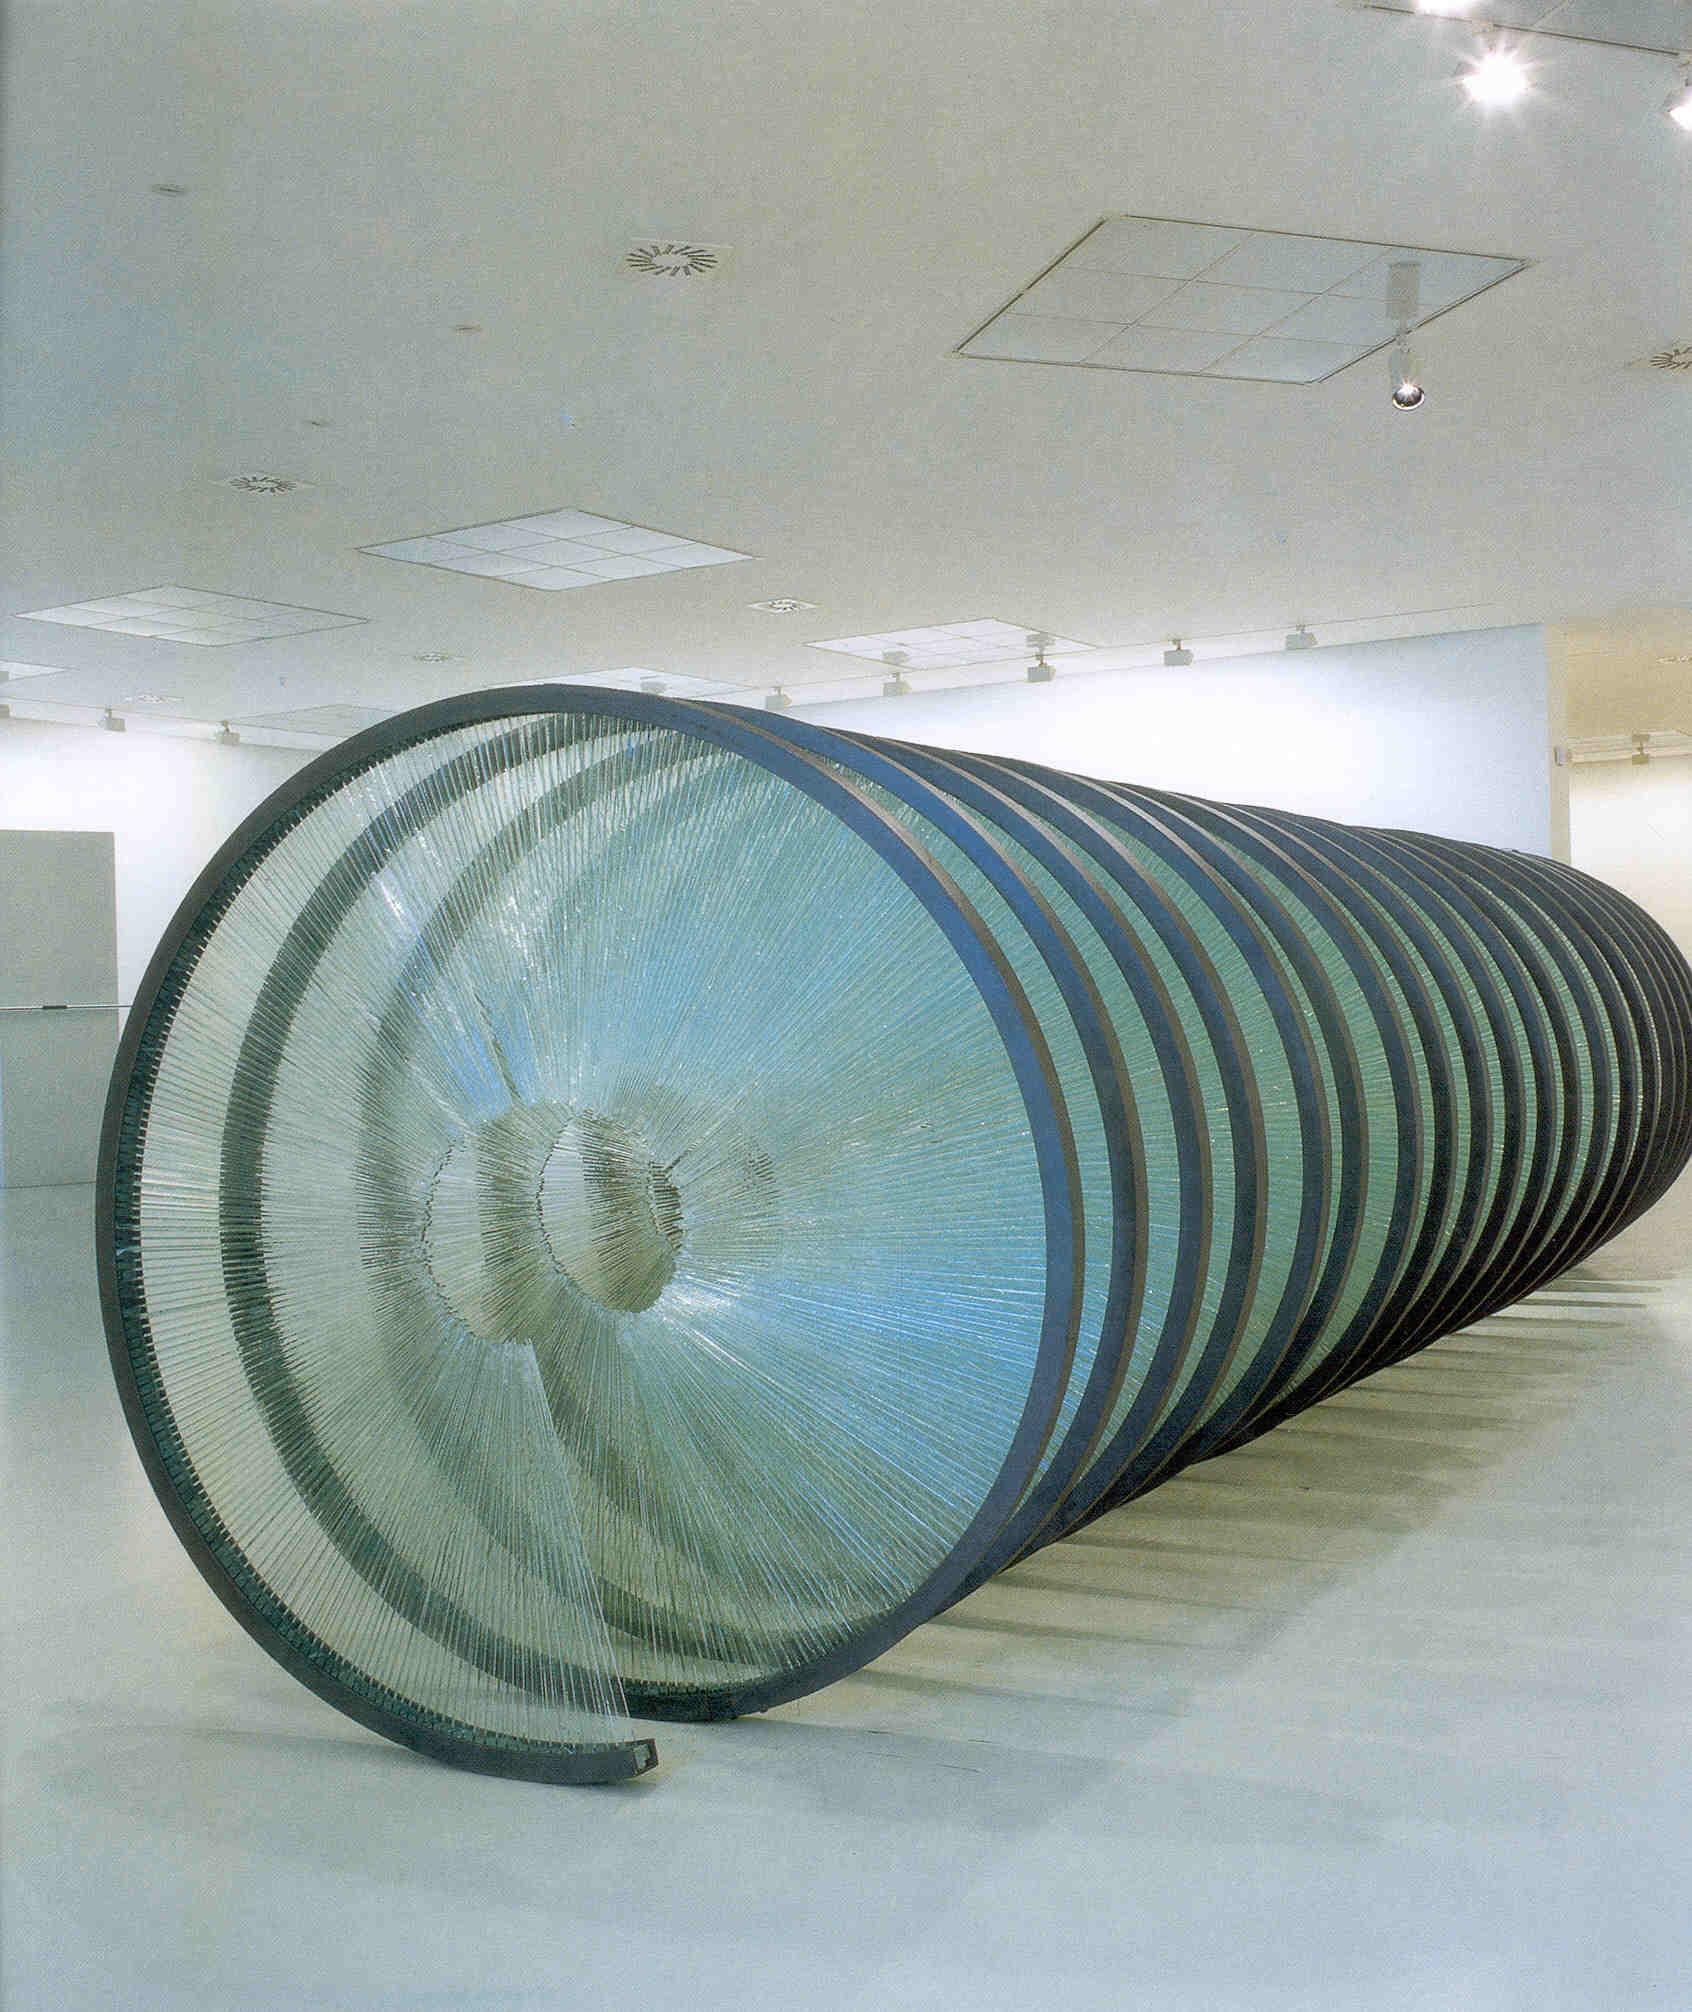 OSTAS  VAROTSOS, Atene (Grecia), 1955 Spiral, 1998 Courtesy the artist and Giorgio Persano Gallery, Torino. Opera esposta presso Museo Medievale San Lorentino